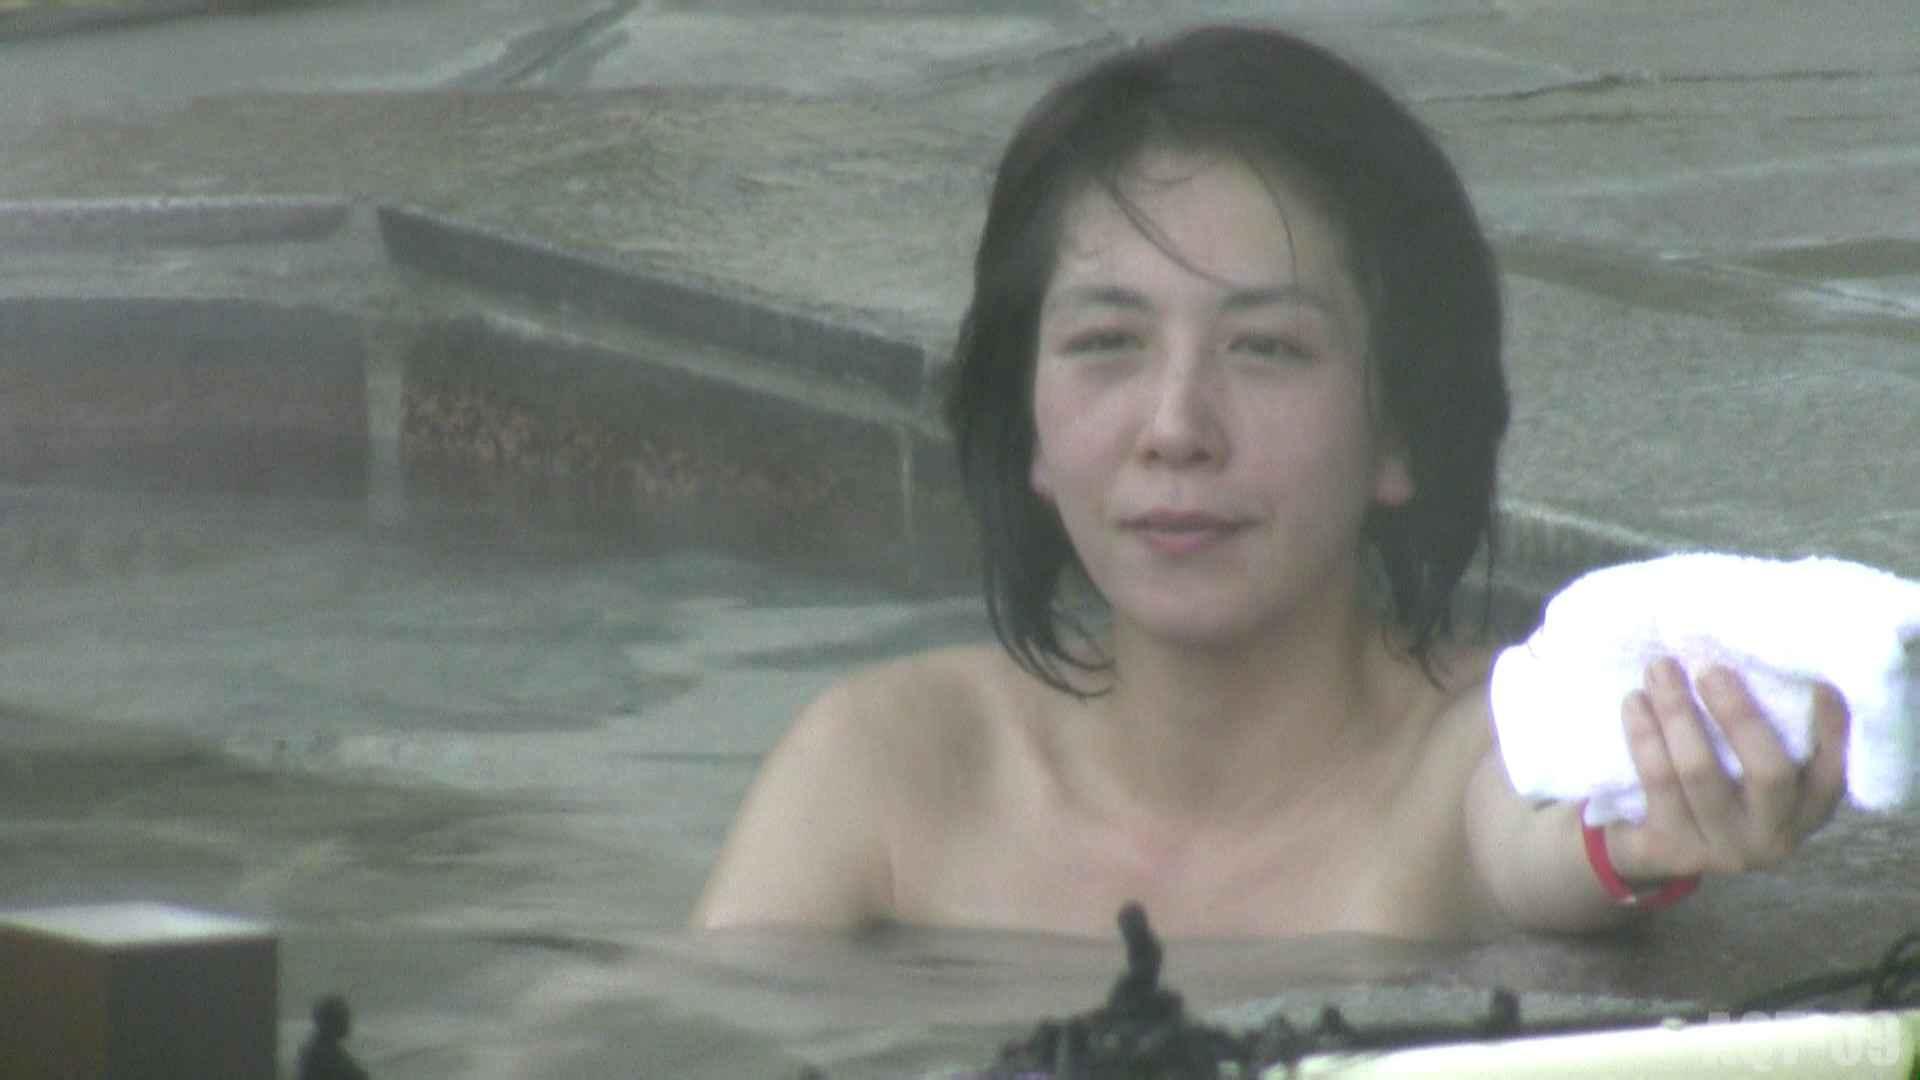 Aquaな露天風呂Vol.788 盗撮師作品  100pic 30